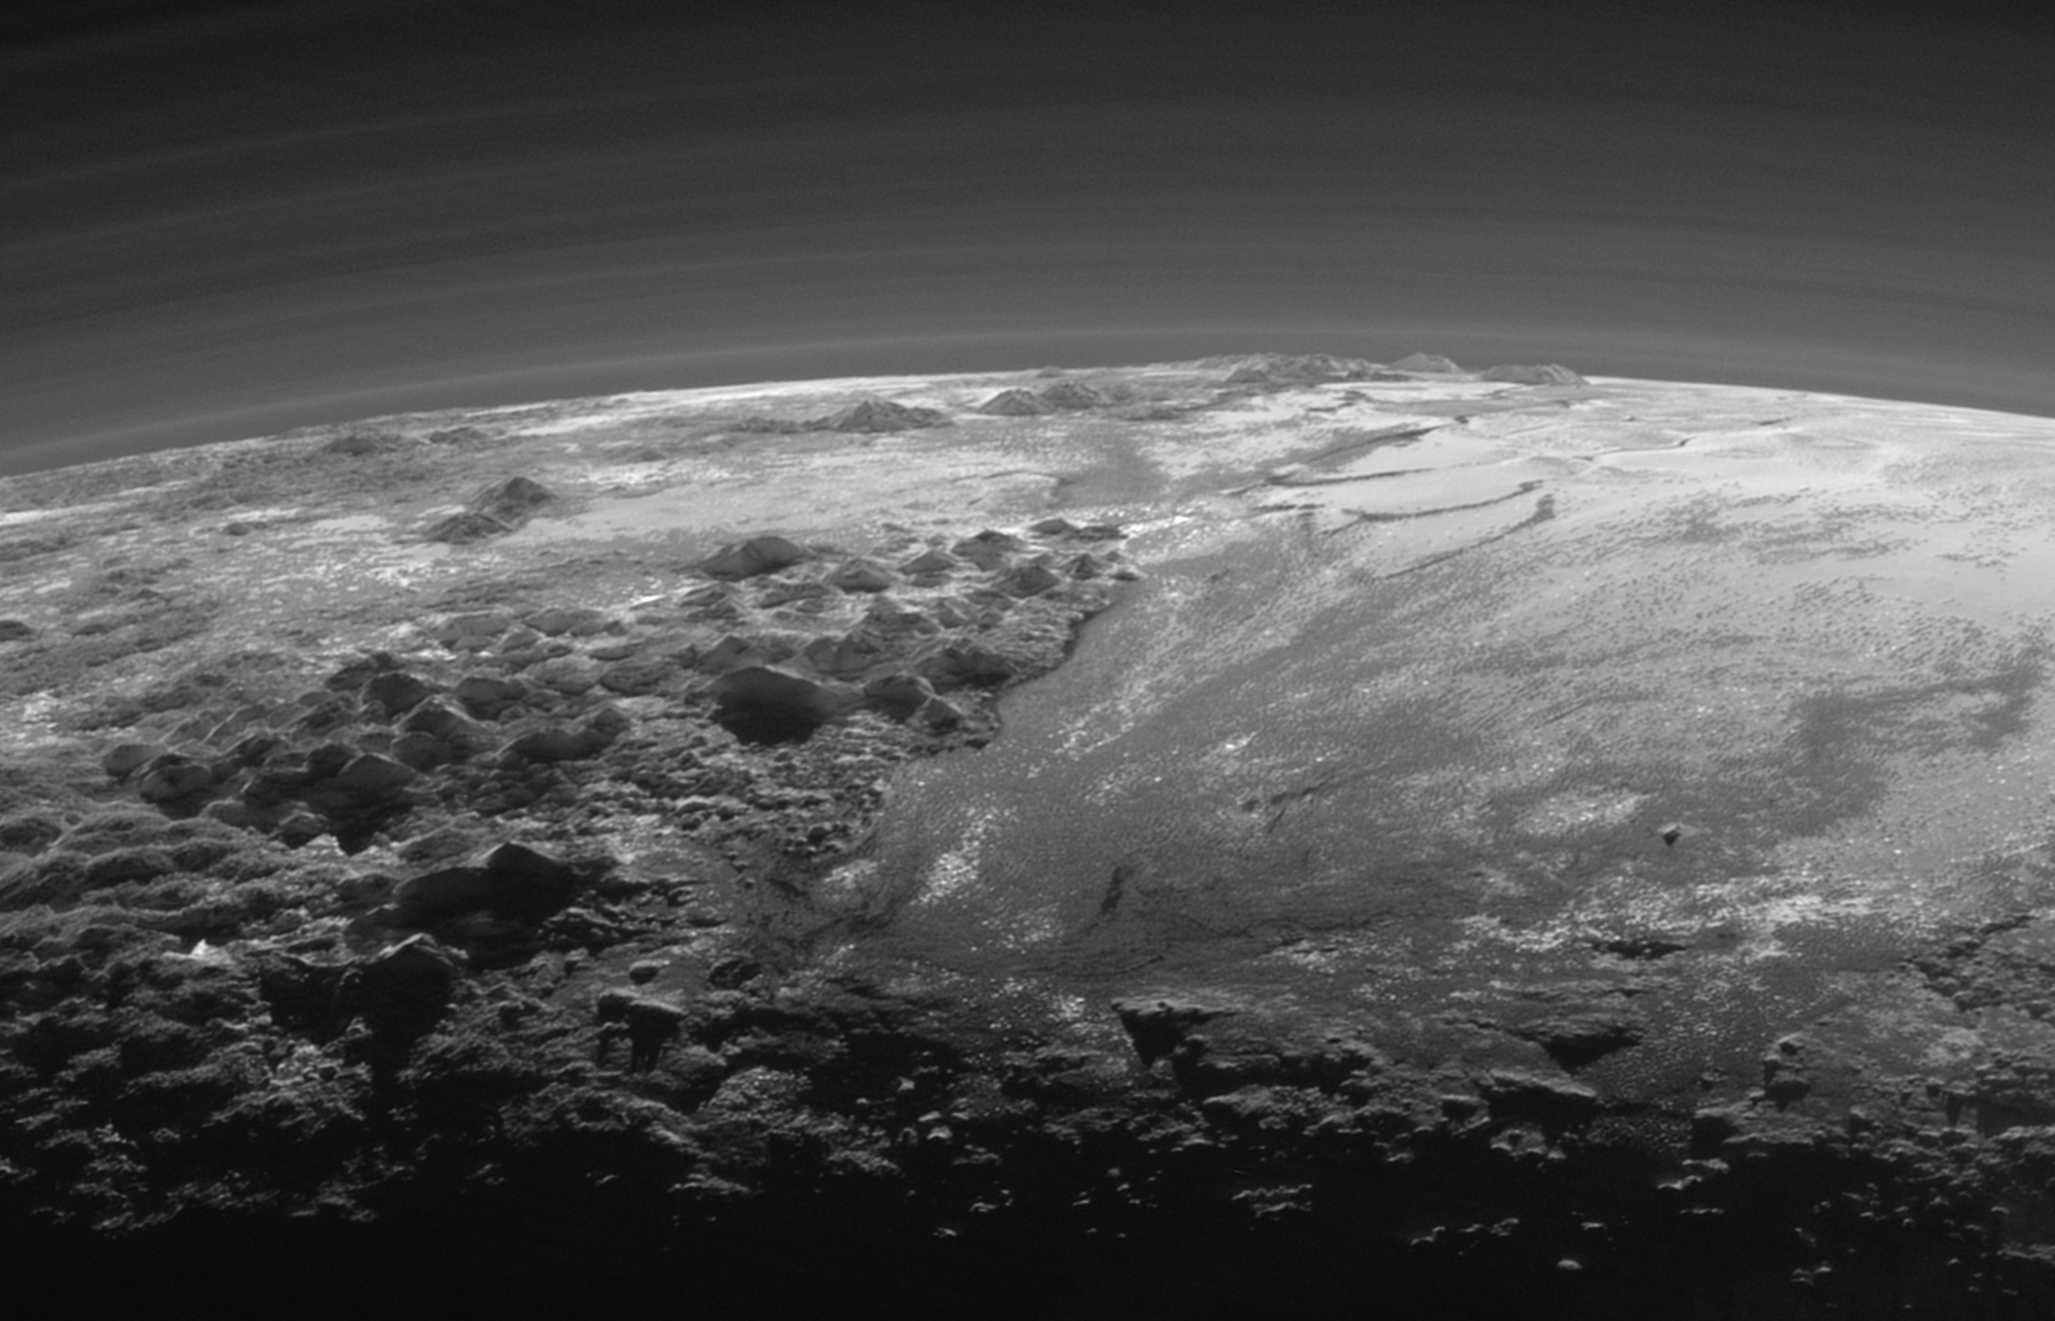 A closer look. Image courtesy of NASA/JHUAPL/SwRI